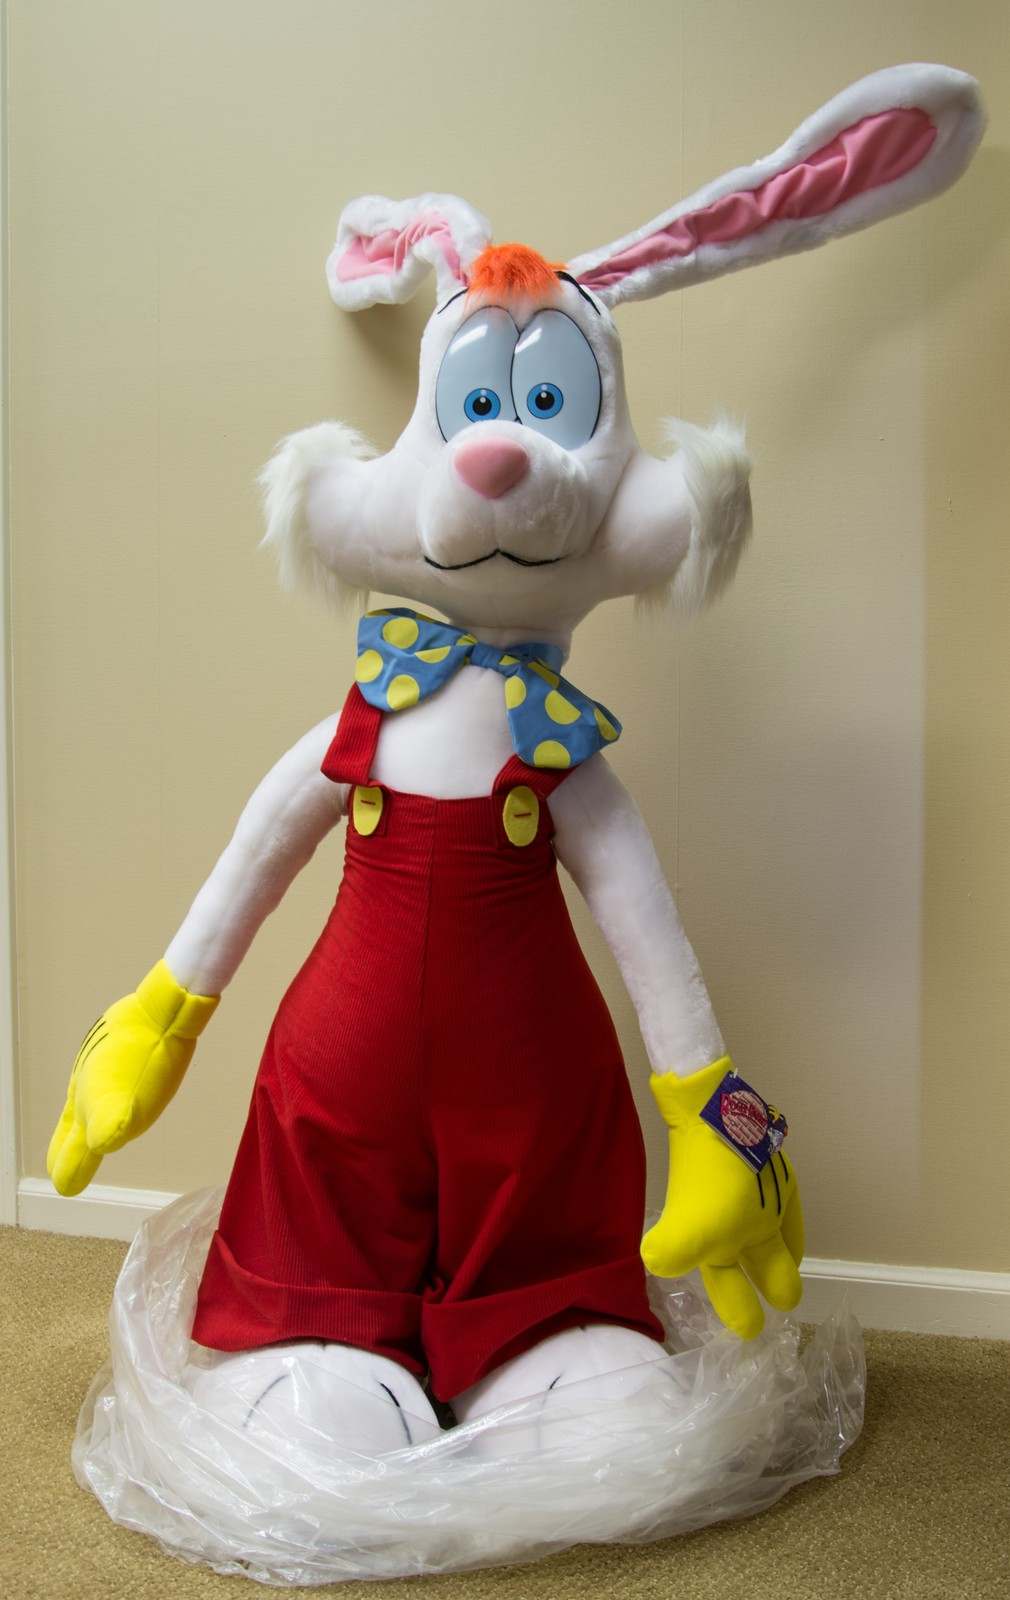 Roger Rabbit 4 Feet Tall 1988 Plush Display And 50 Similar Items